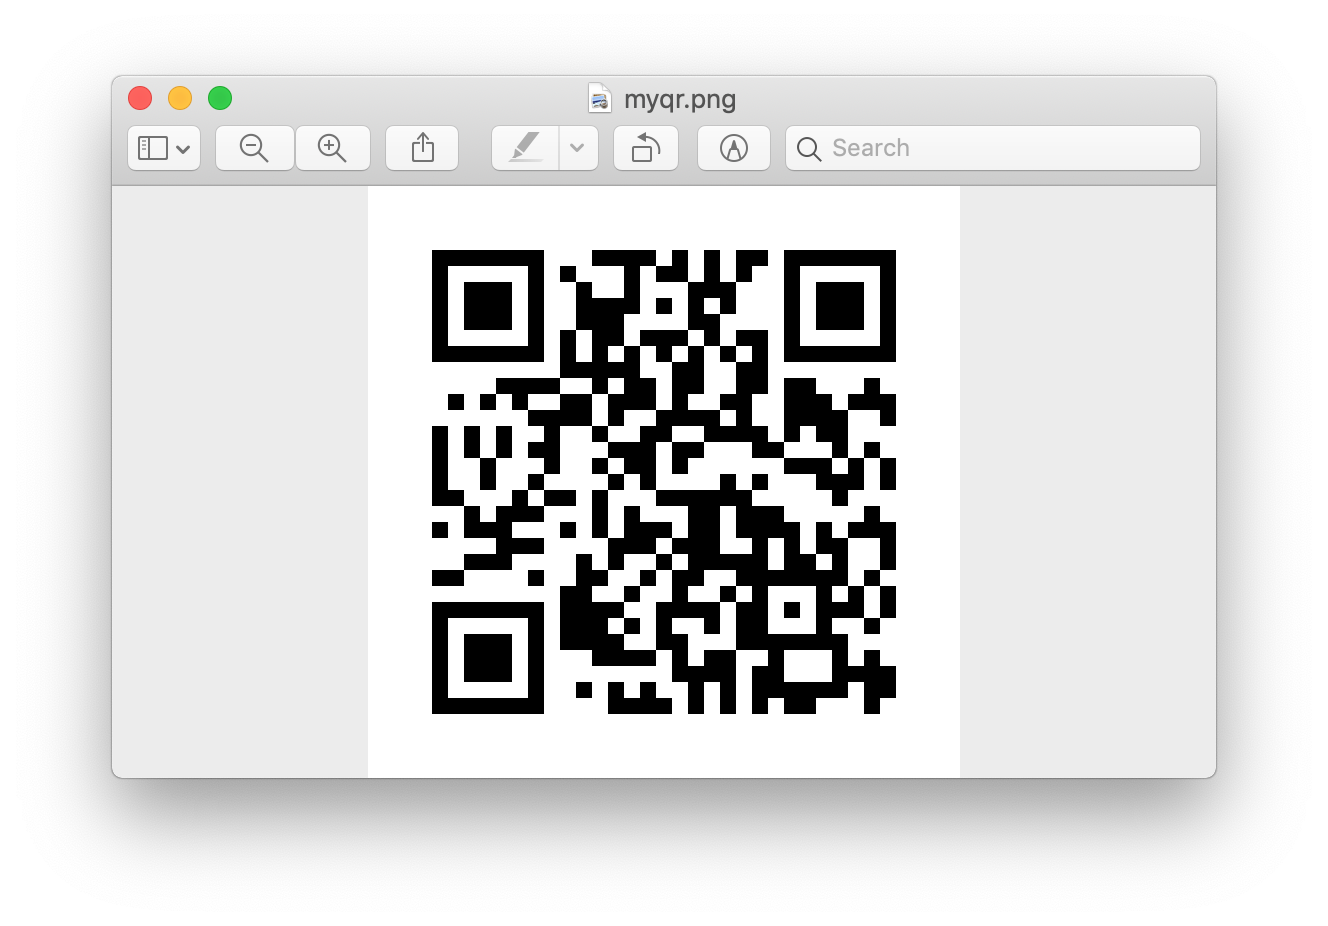 Python | Generate QR Code using pyqrcode module - GeeksforGeeks